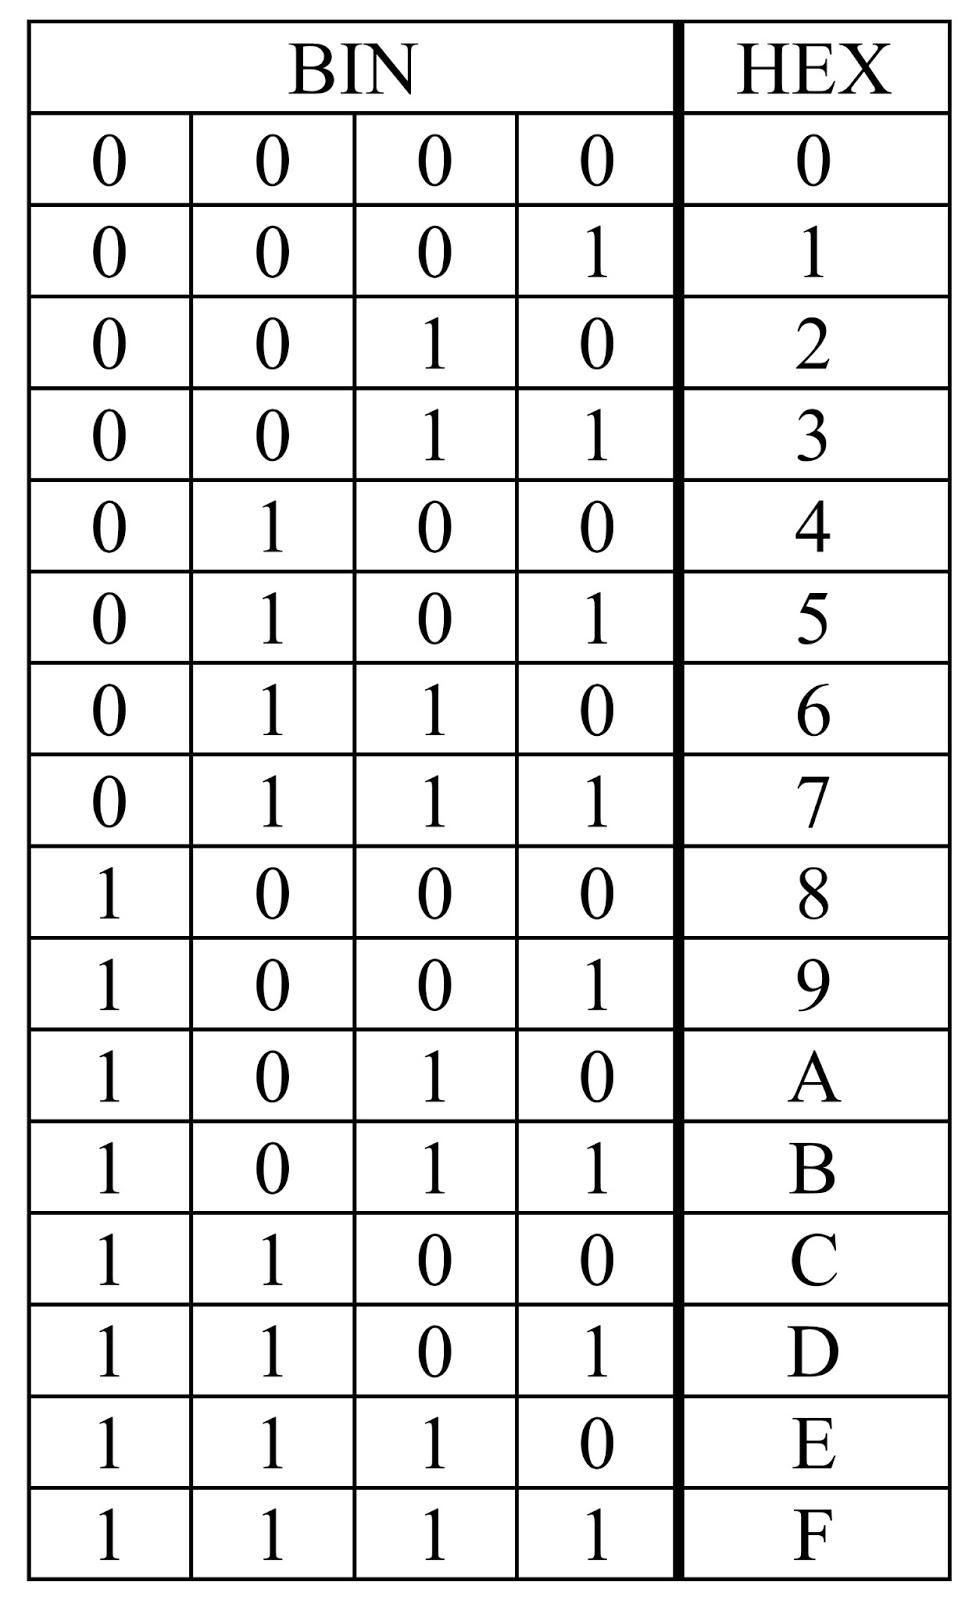 Setoption binary